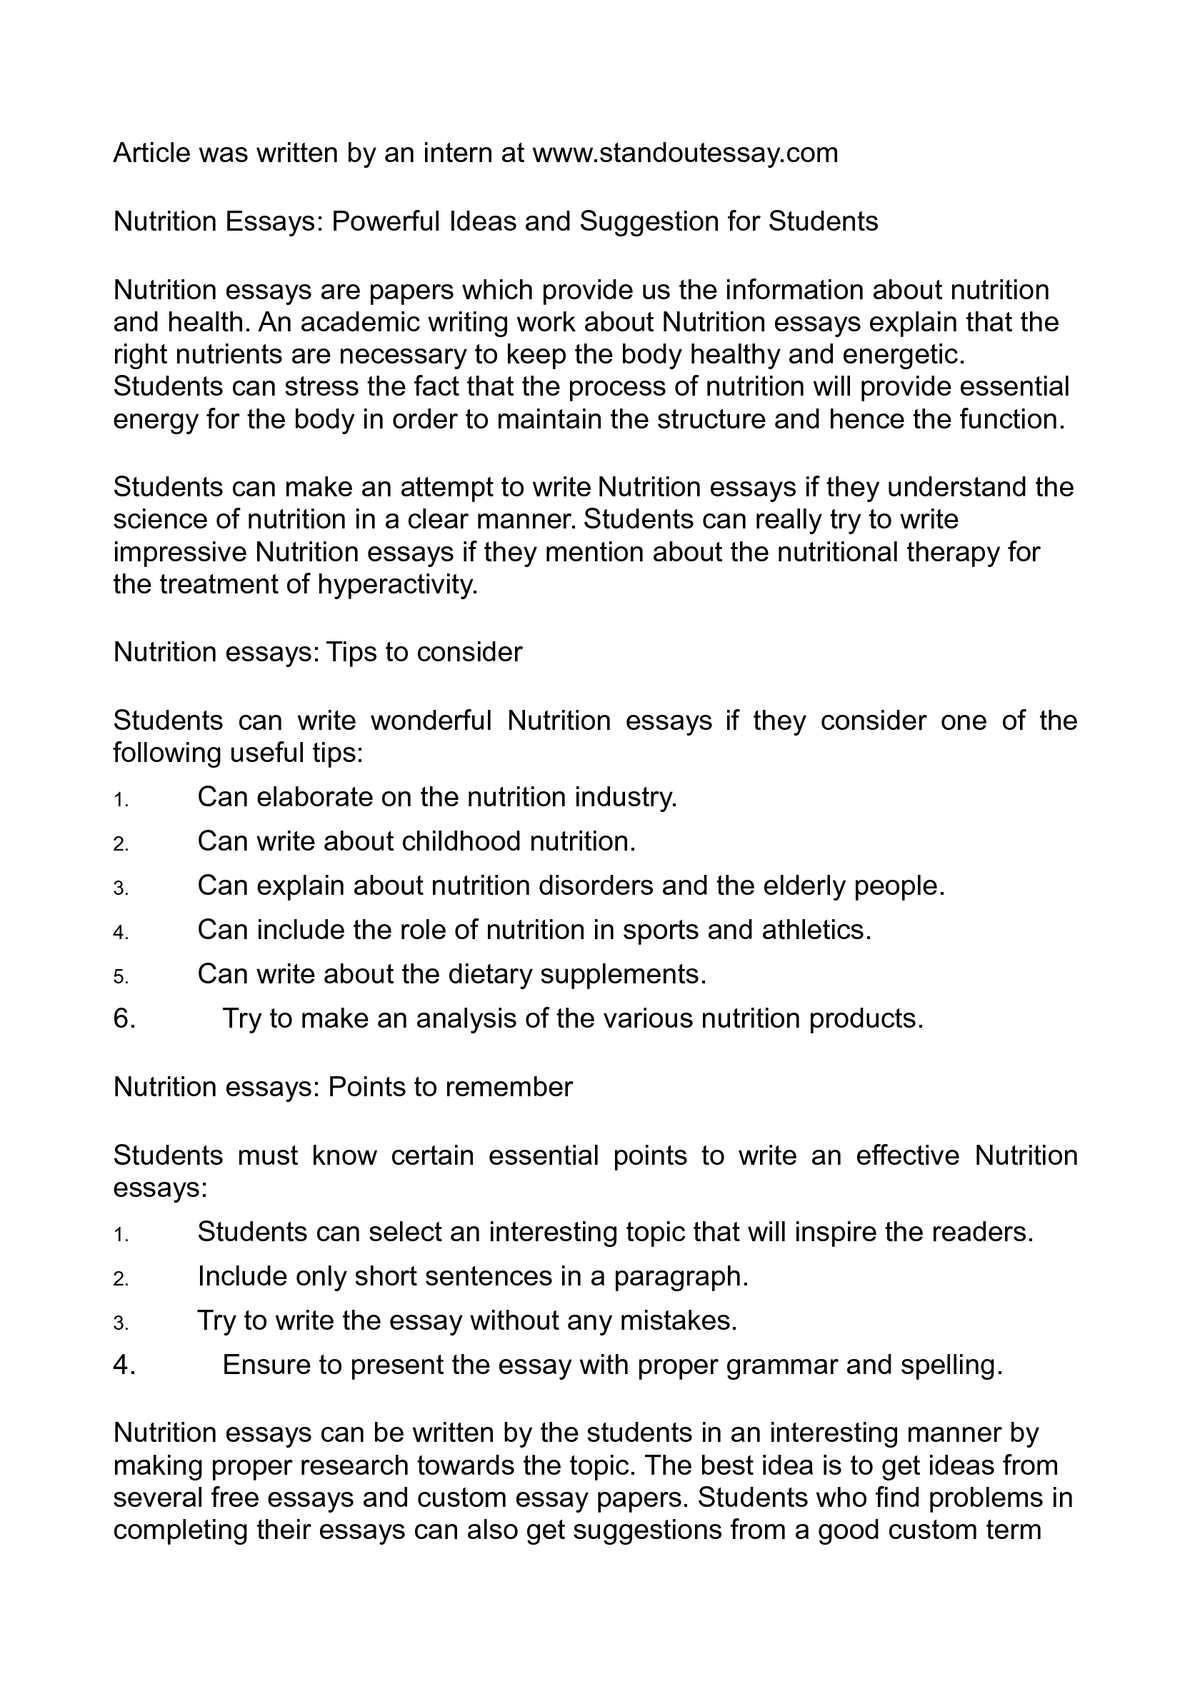 Calaméo - Nutrition Essays: Powerful Ideas and Suggestion